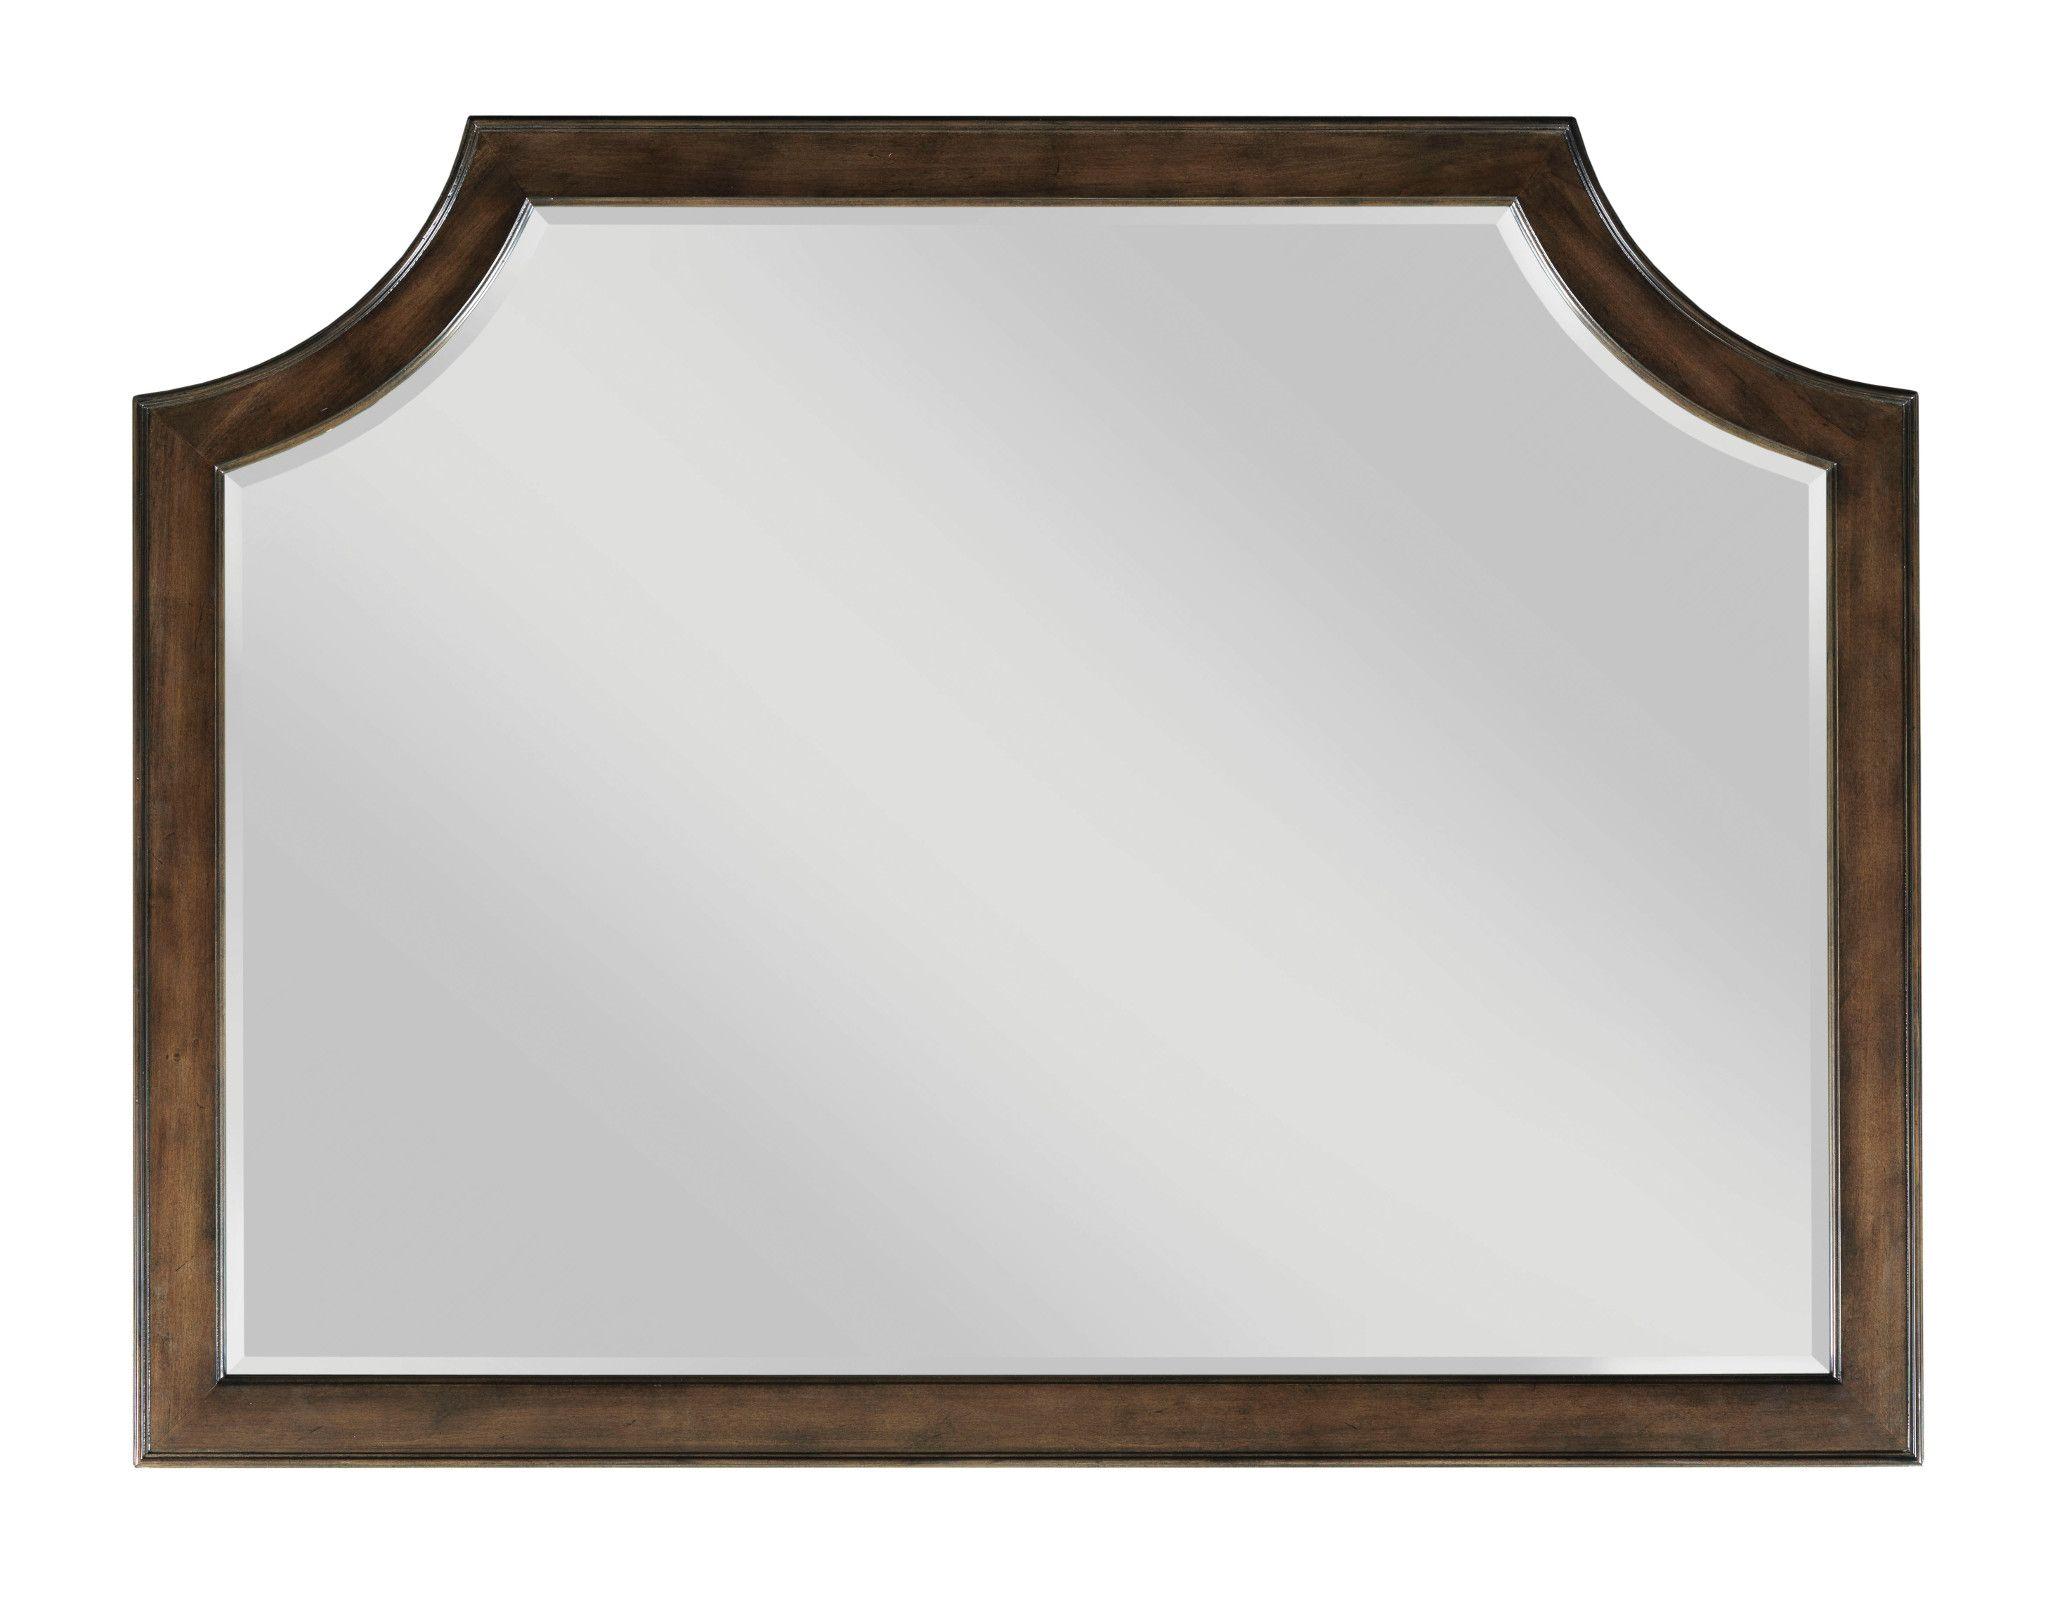 American Drew Grantham Hall Landscape Mirror  - Item Number: 512-030